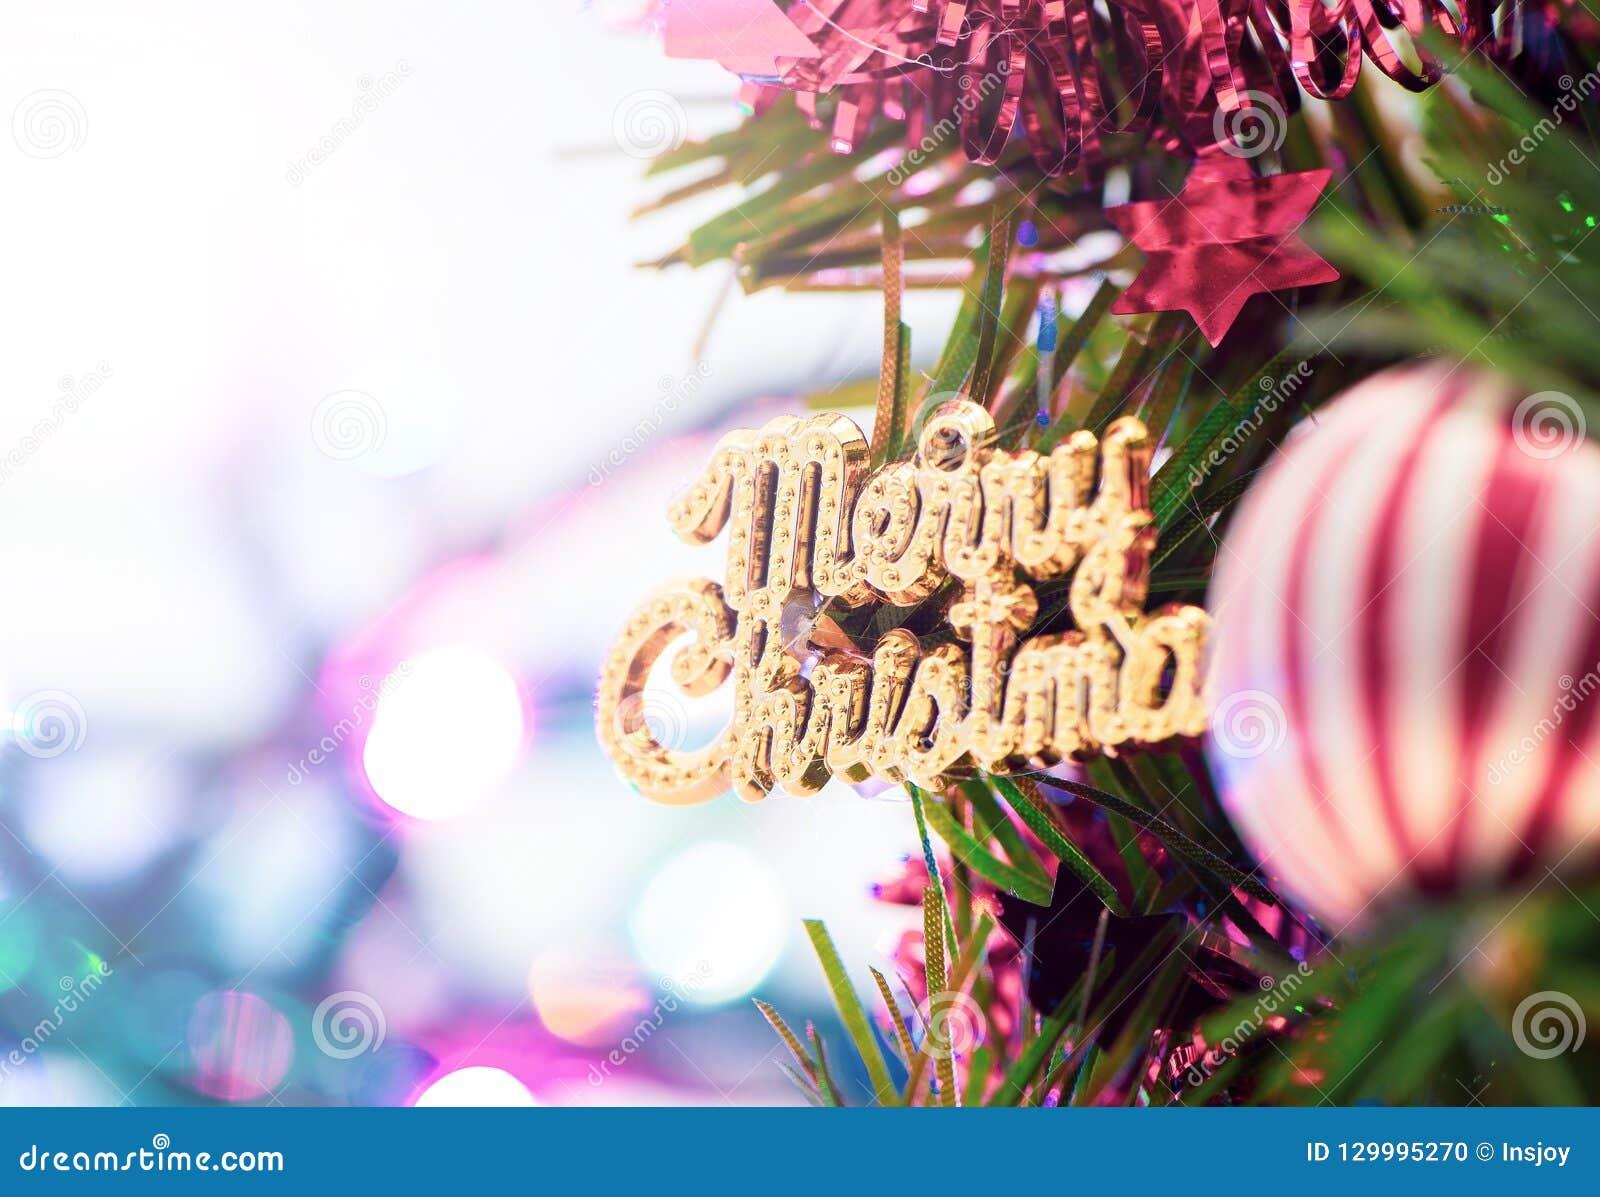 Christmas Tree With Beautiful Xmas Decoration Stock Photo - Image of ...